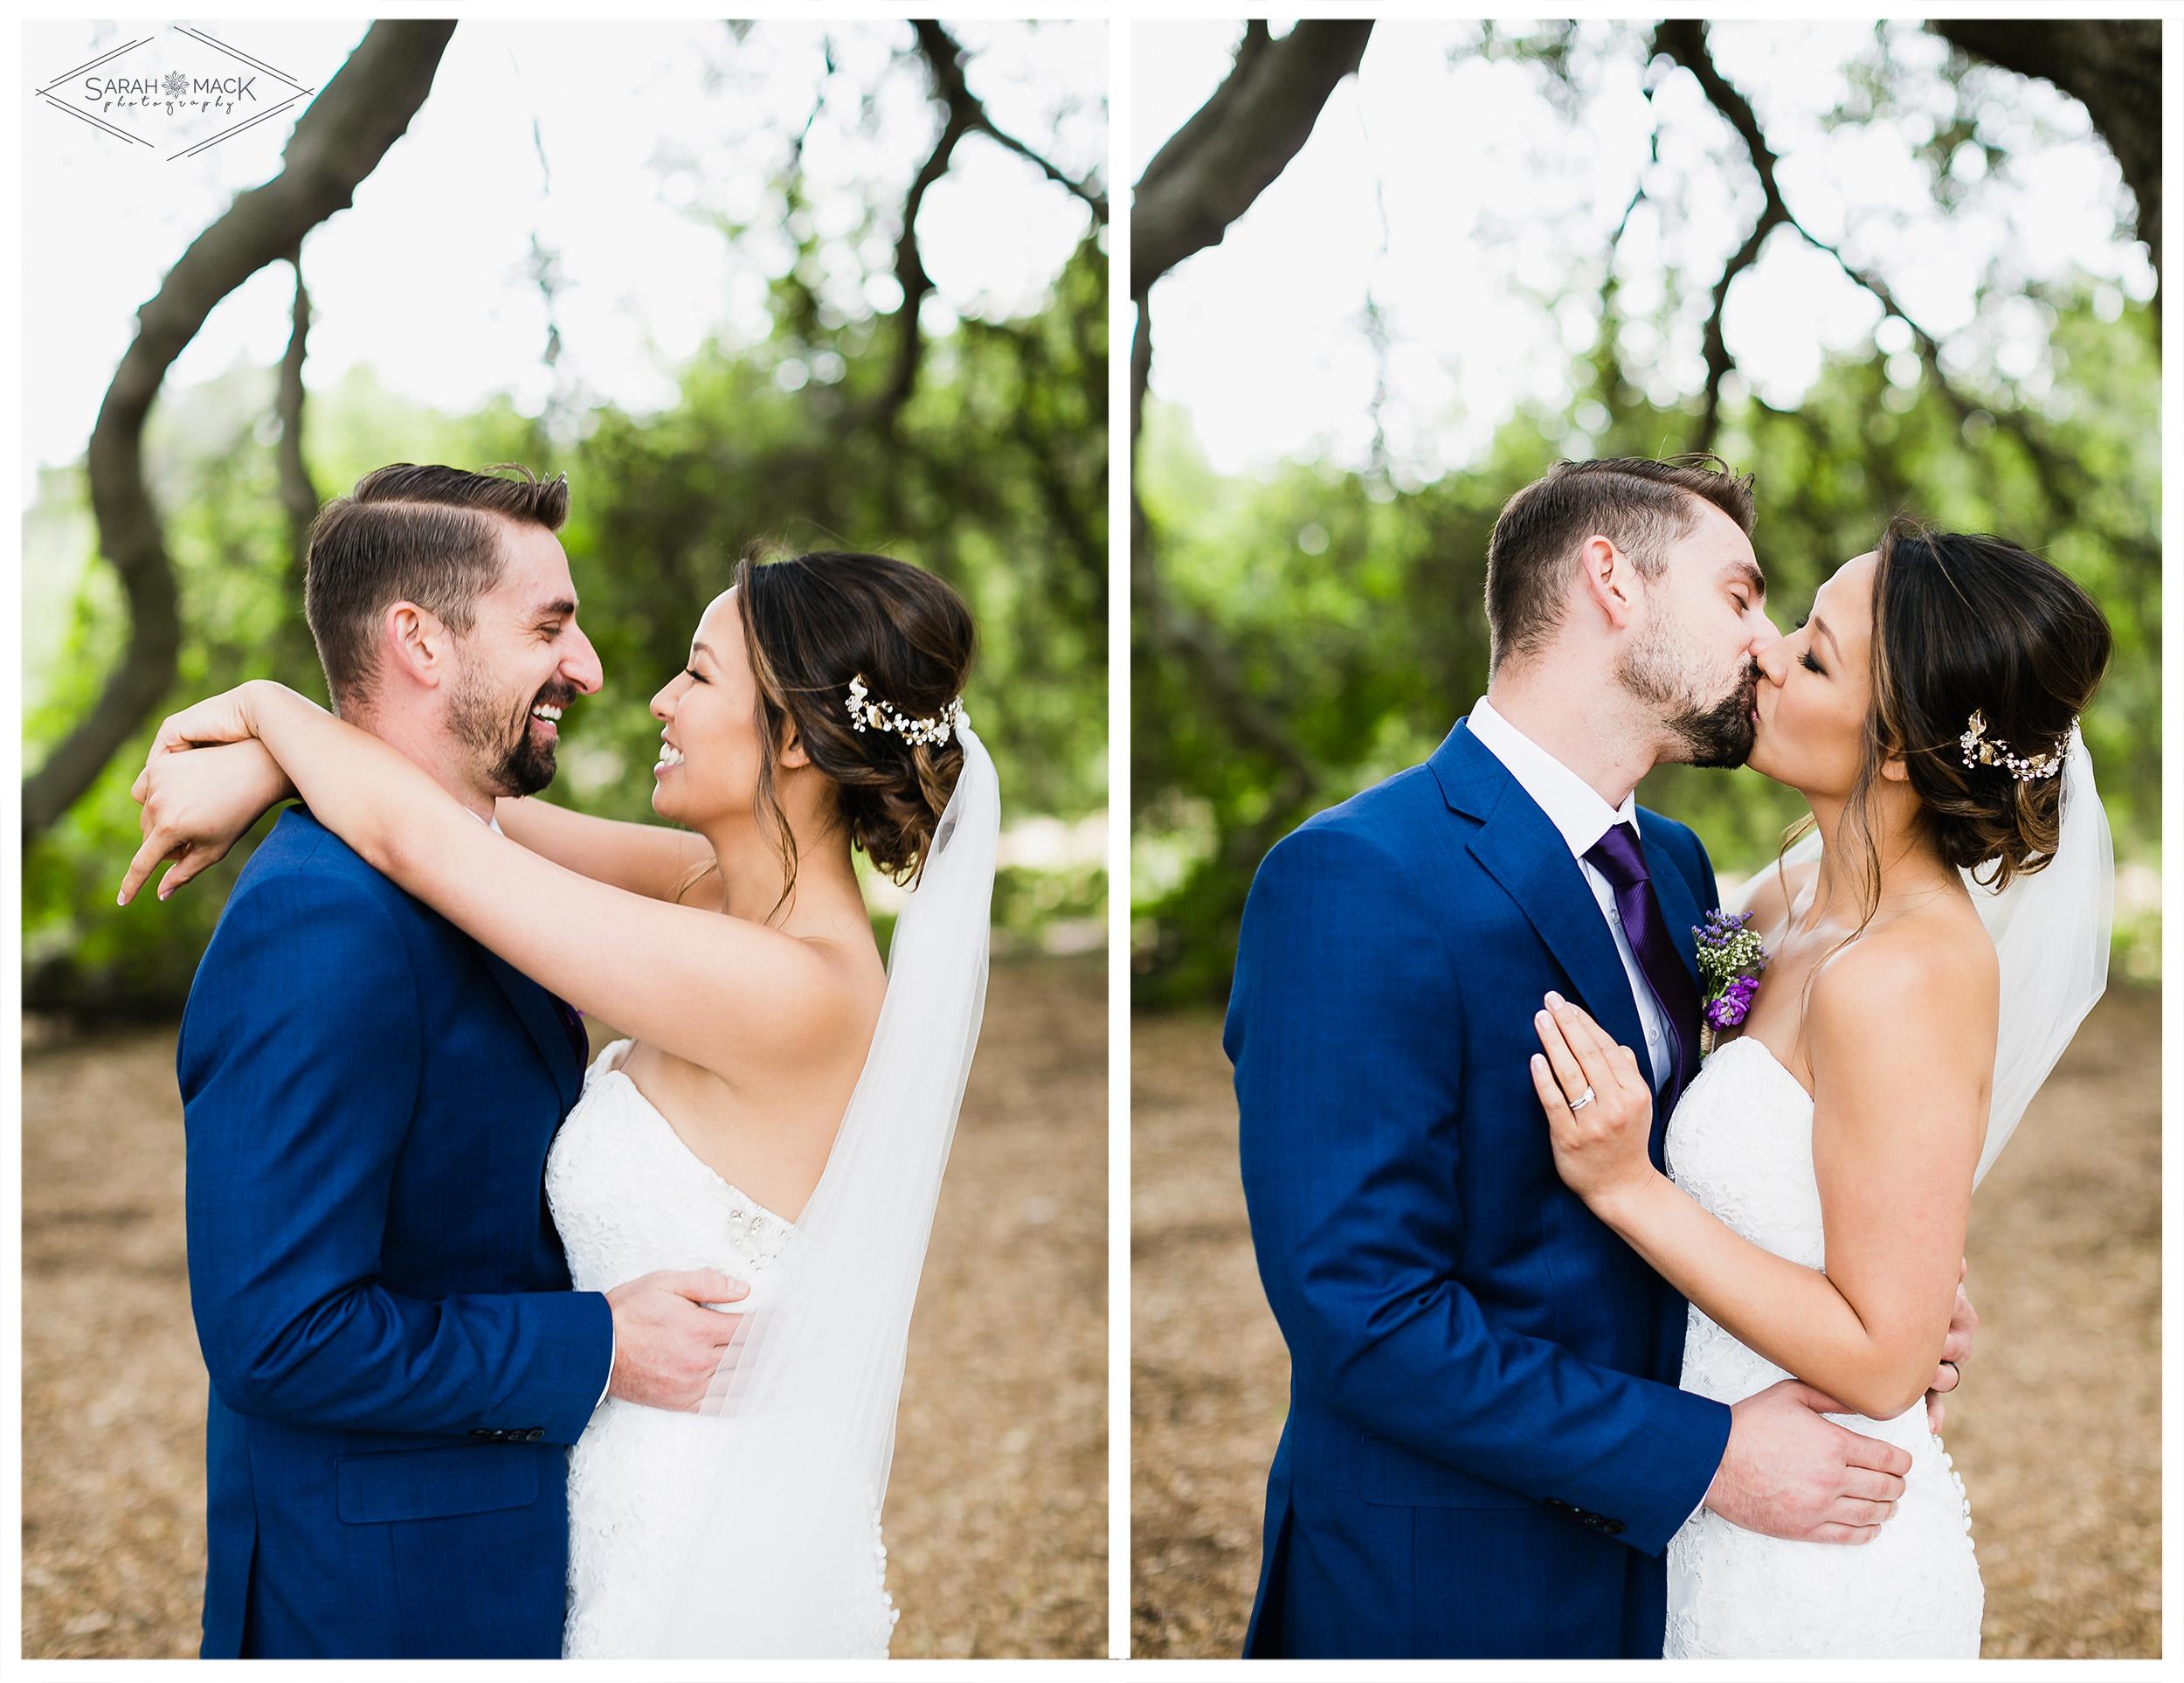 PG-Owl-Creek-Farms-Temecula-Wedding-Photography-46.jpg